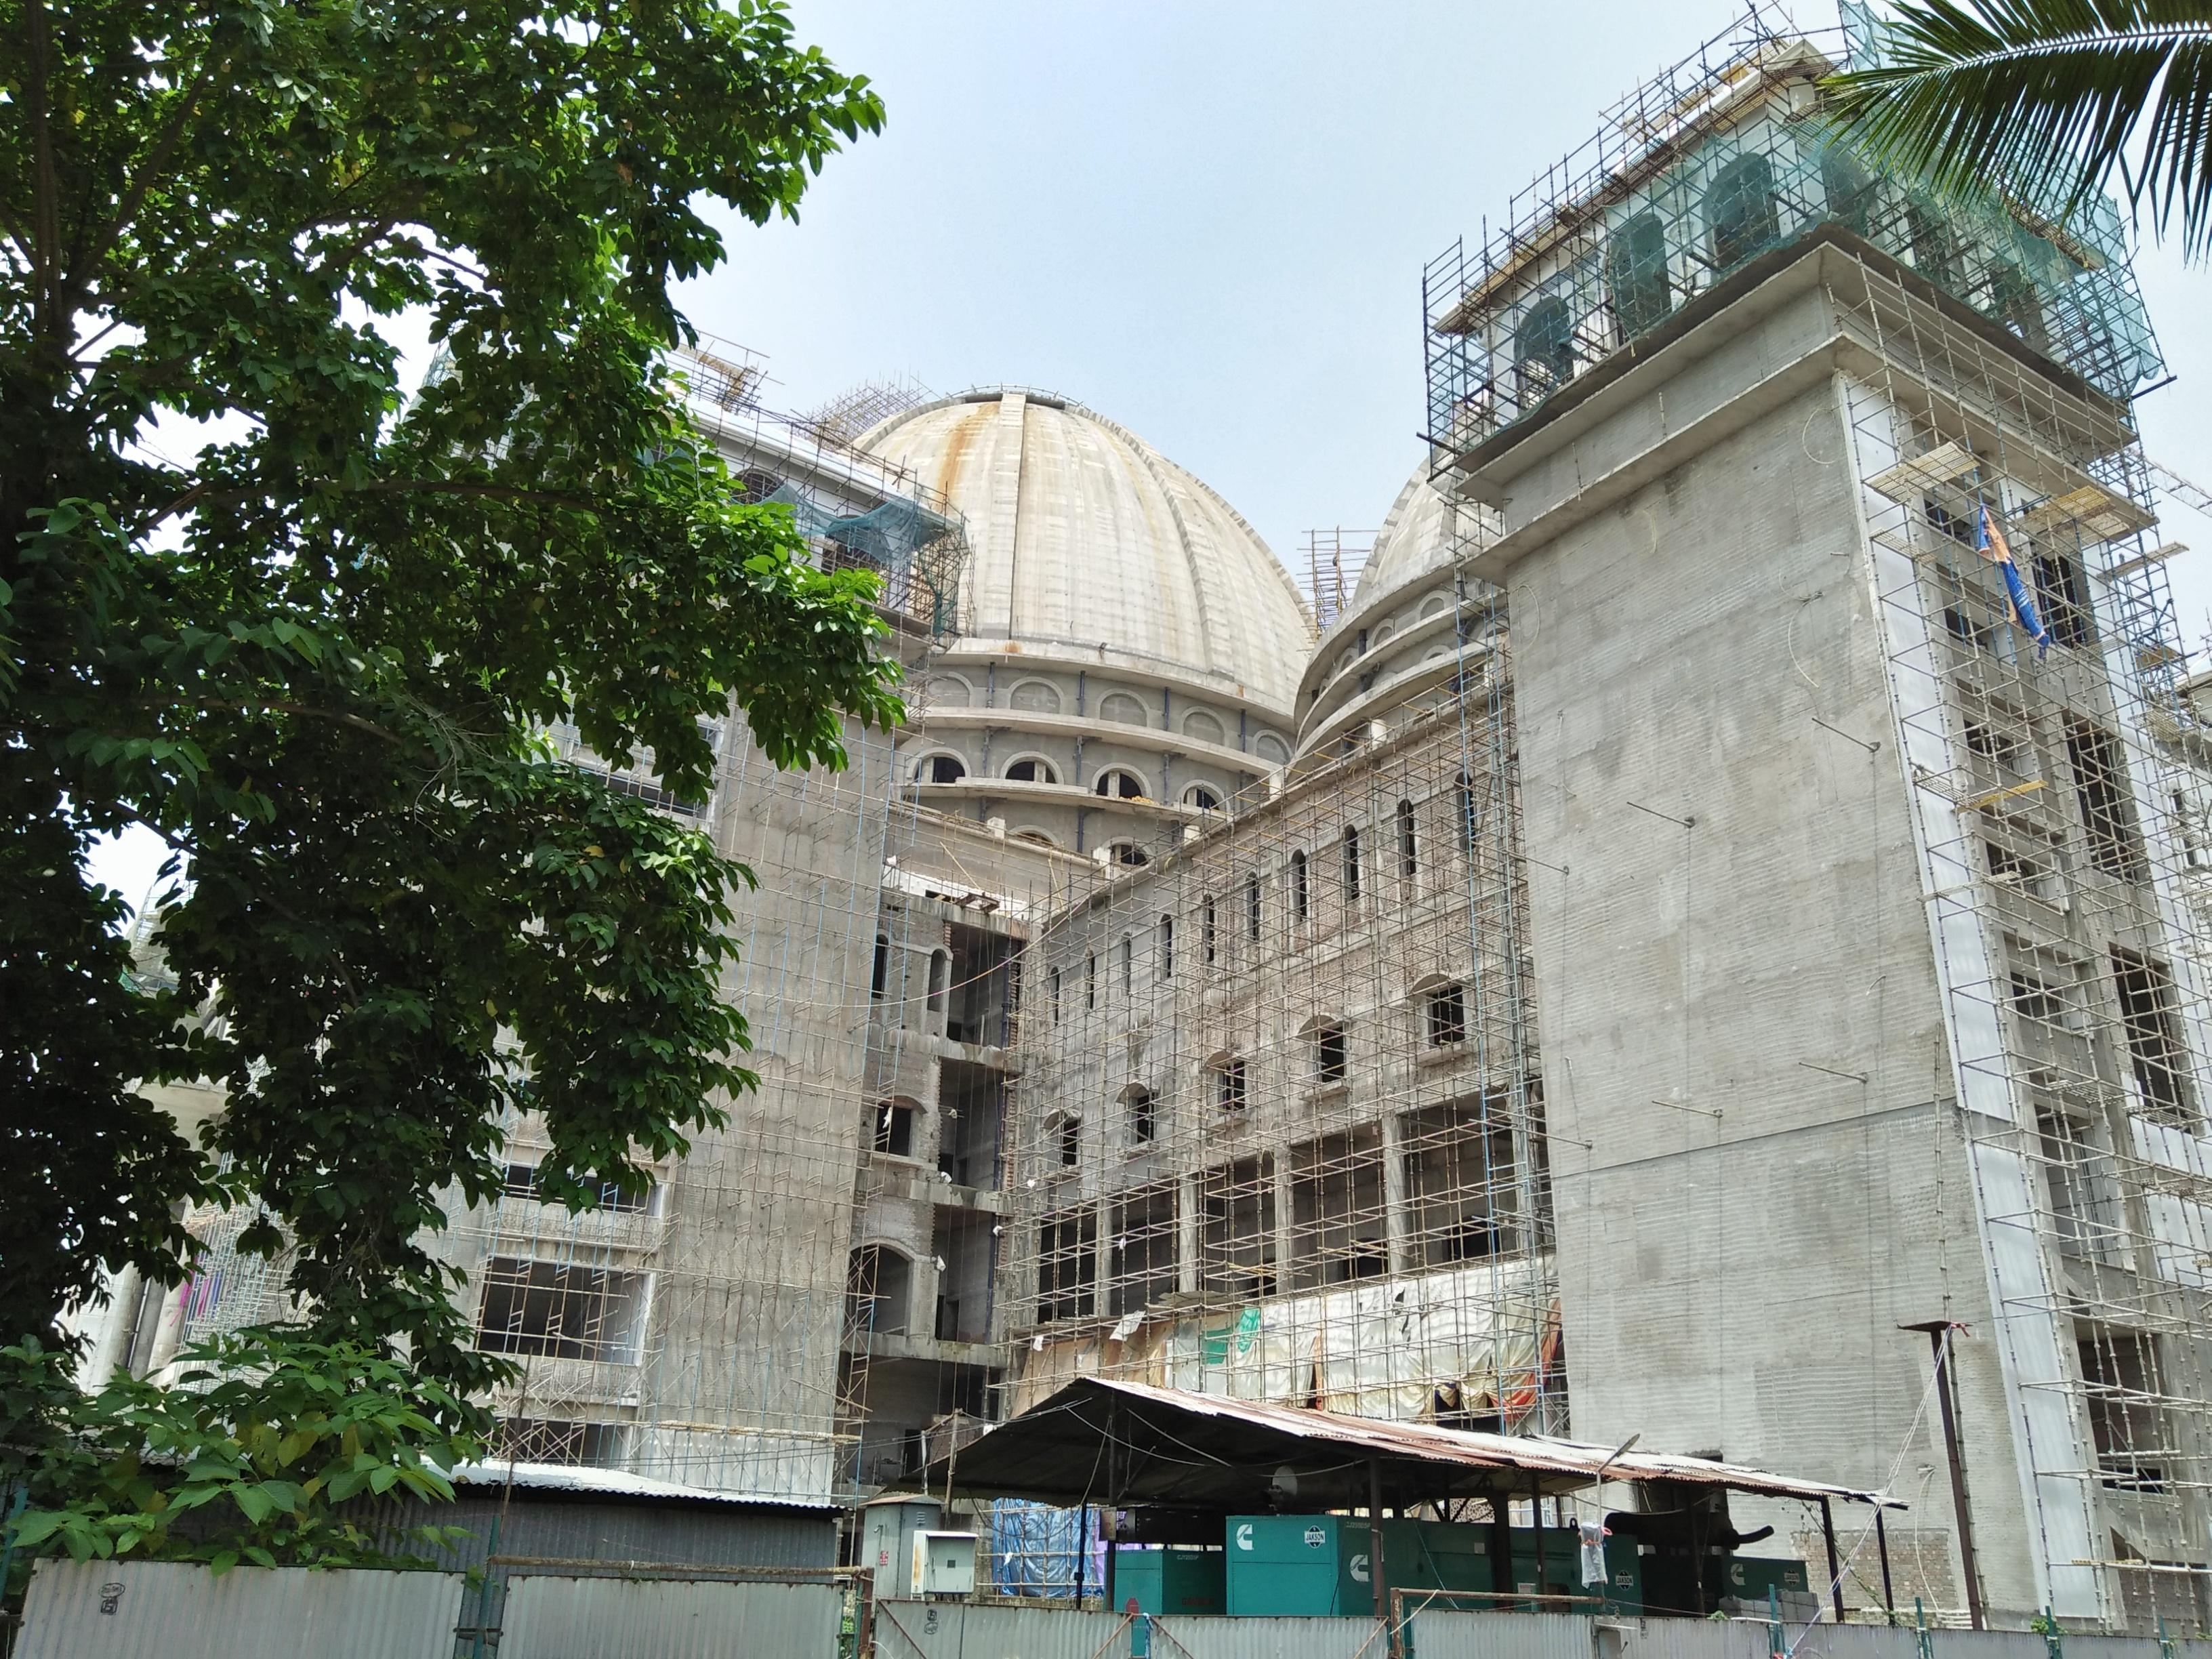 File:Chandrodaya Mandir Under Construction - Temple Of Vedic